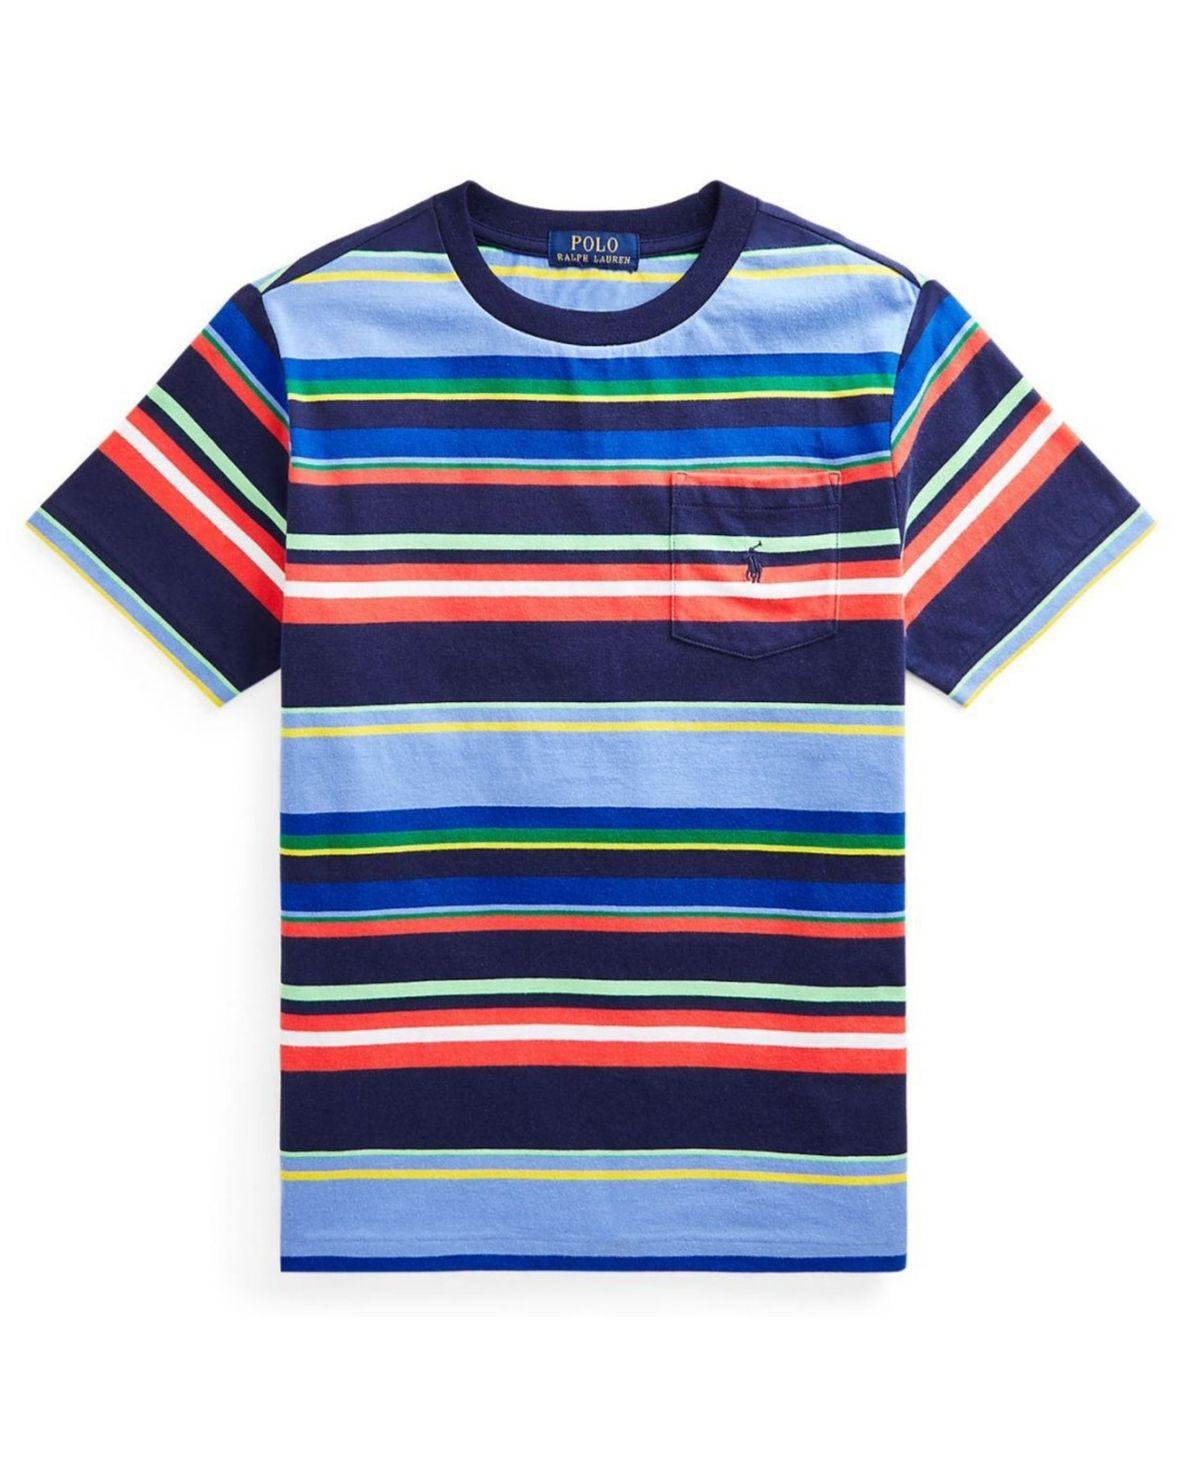 Big Boys Striped Jersey Pocket T-shirt - Newport Navy Multi